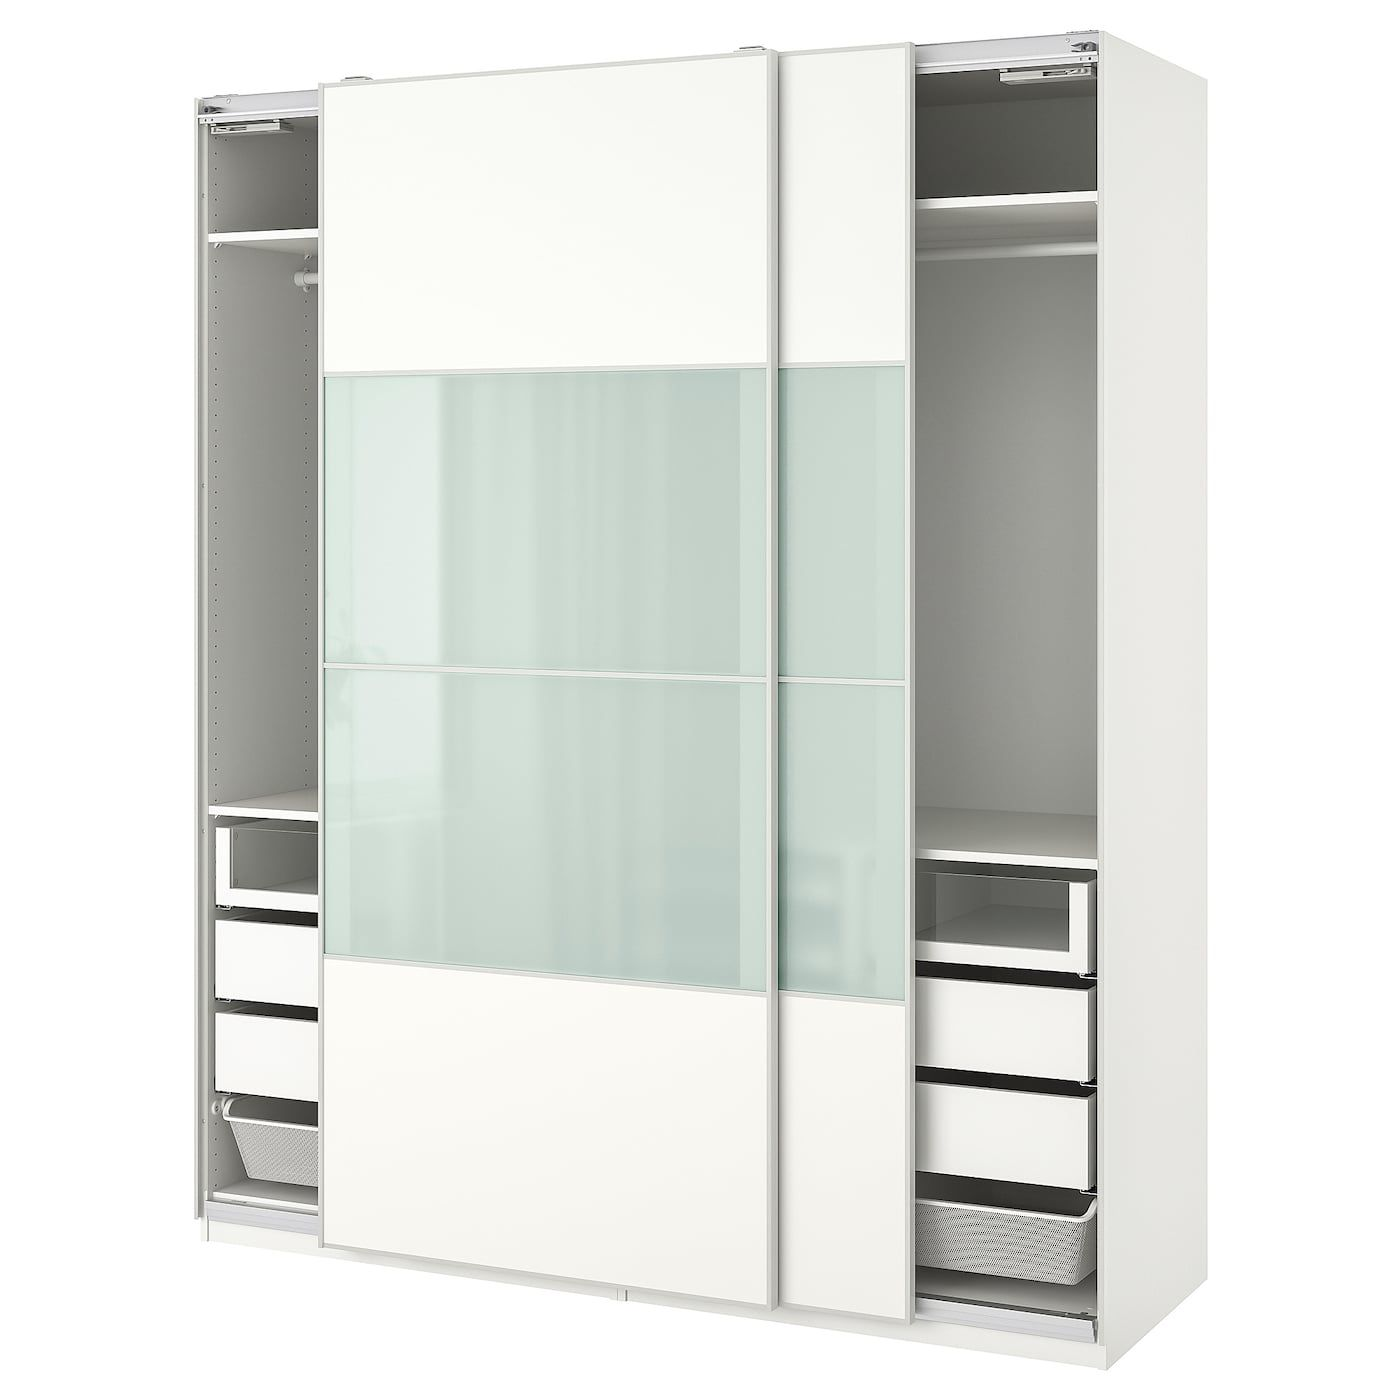 Ikea Tiroir Armoire Pax pax wardrobe - white, mehamn sekken 78 3/4x26x93 1/8